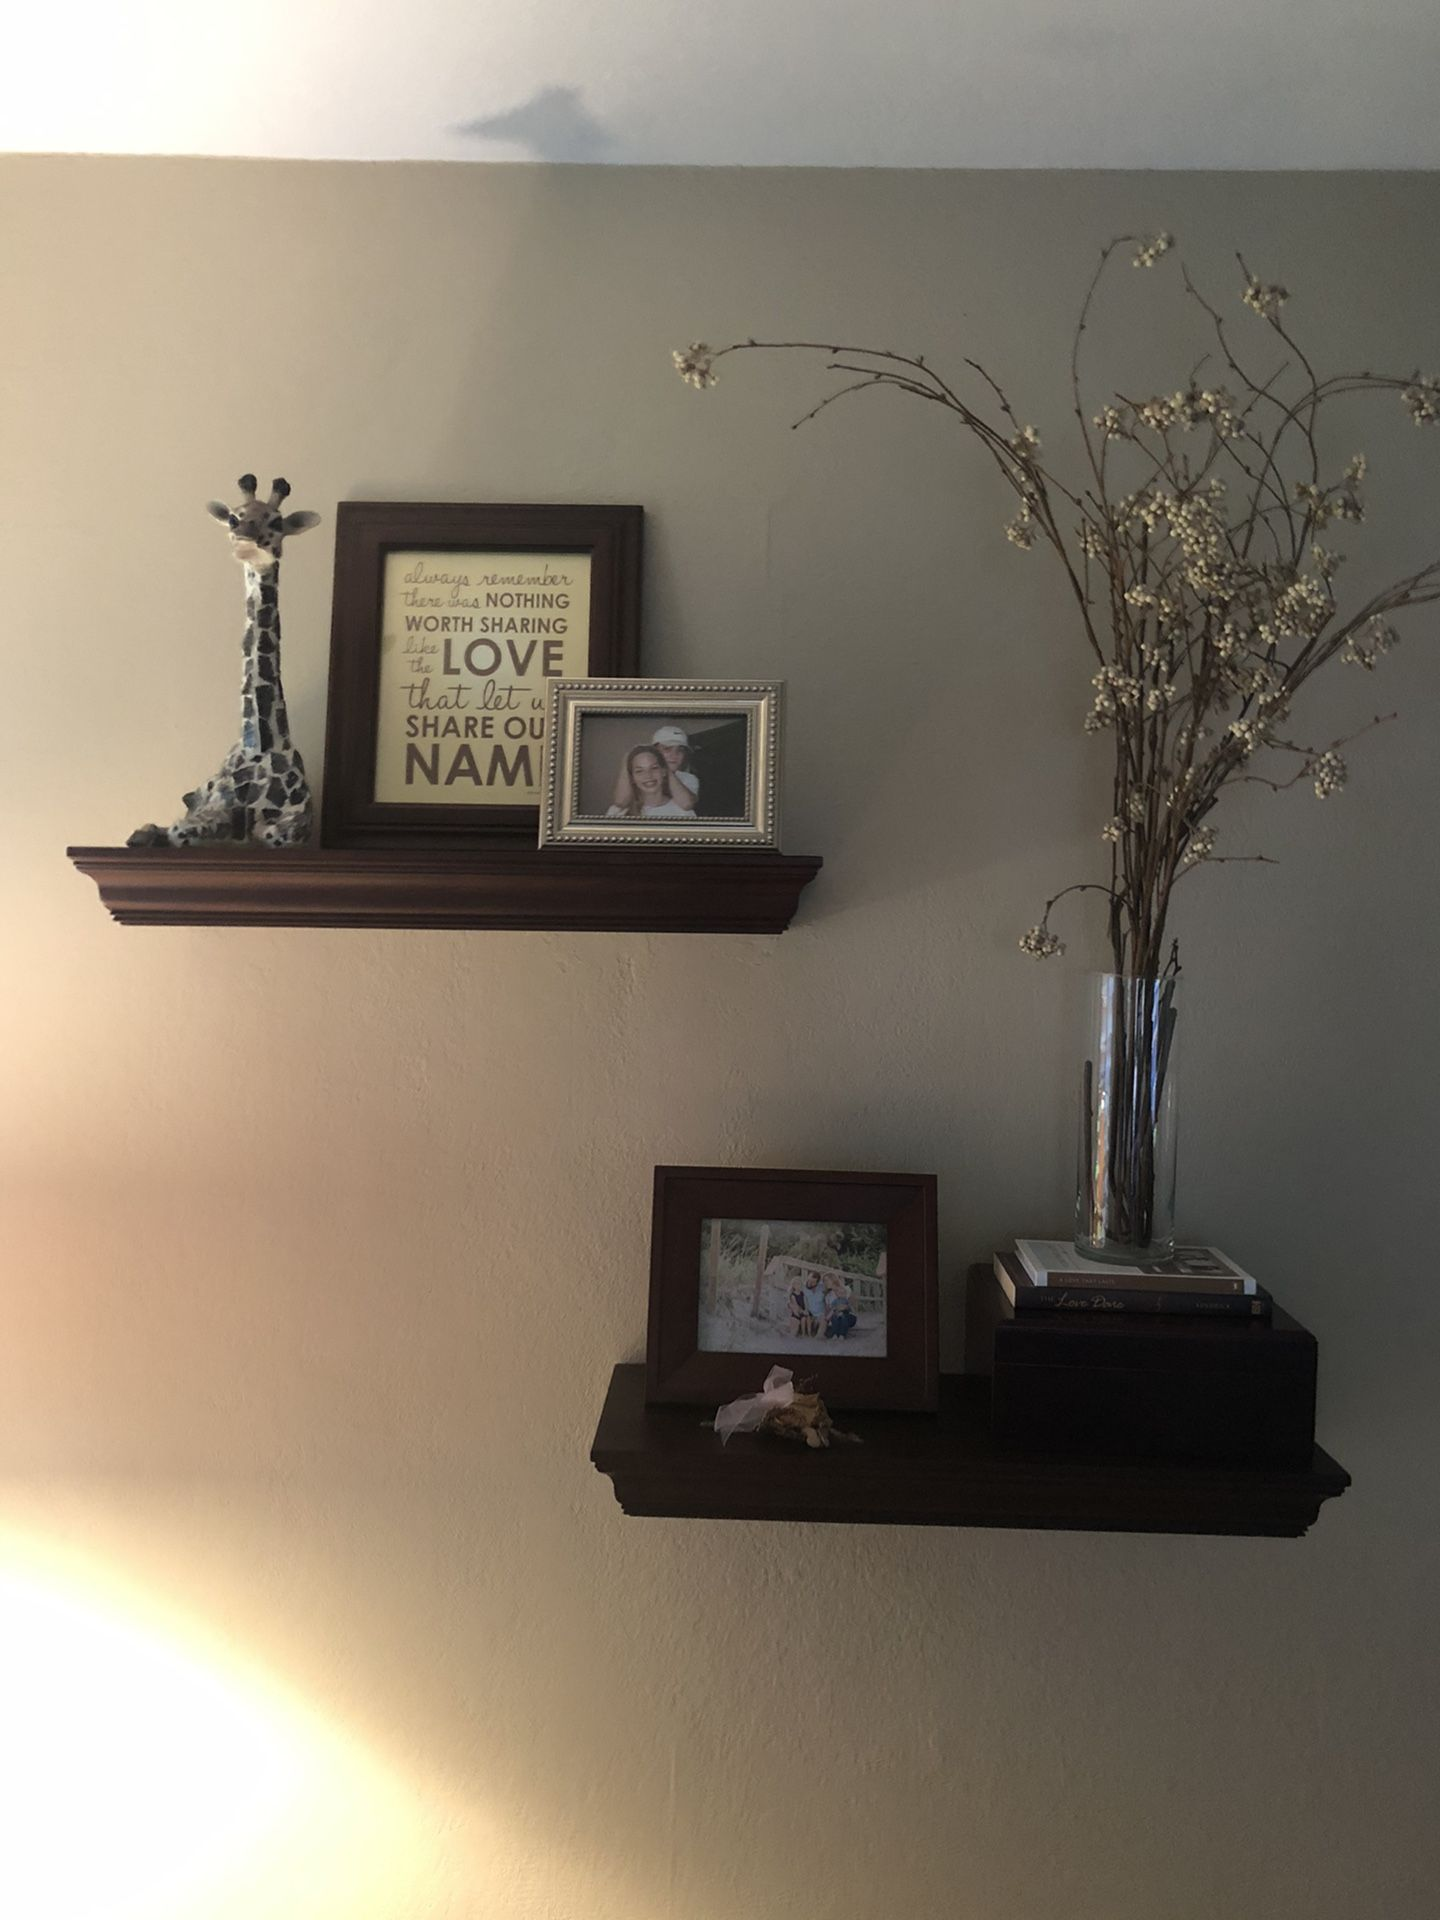 Pottery Barn crown molding floating shelves (set of 3)